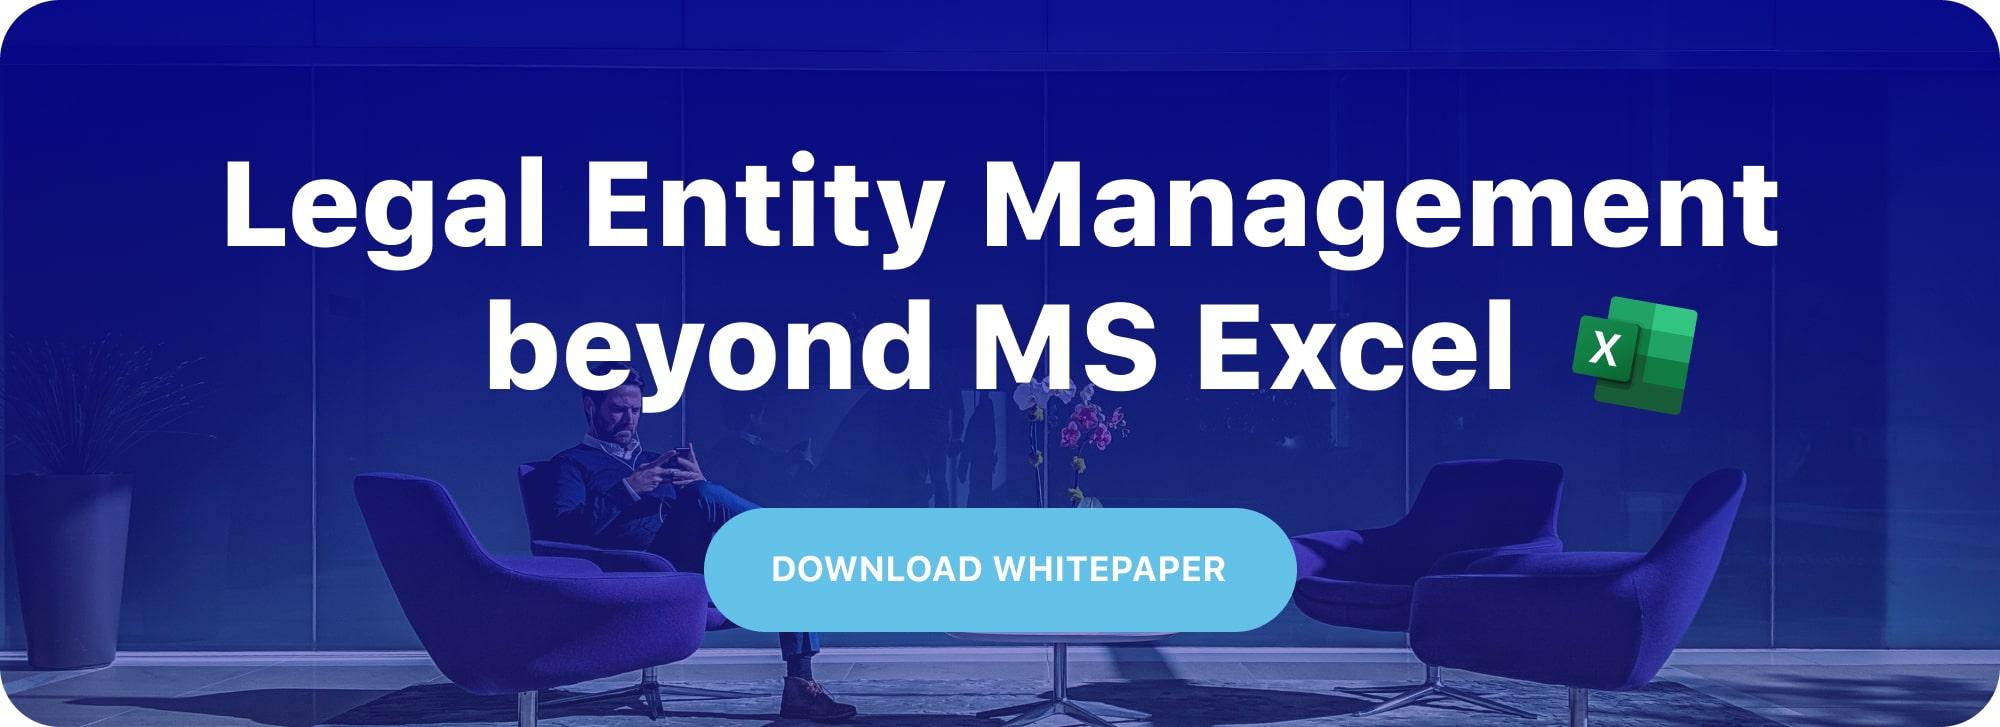 Legal Entity Management beyond MS Excel